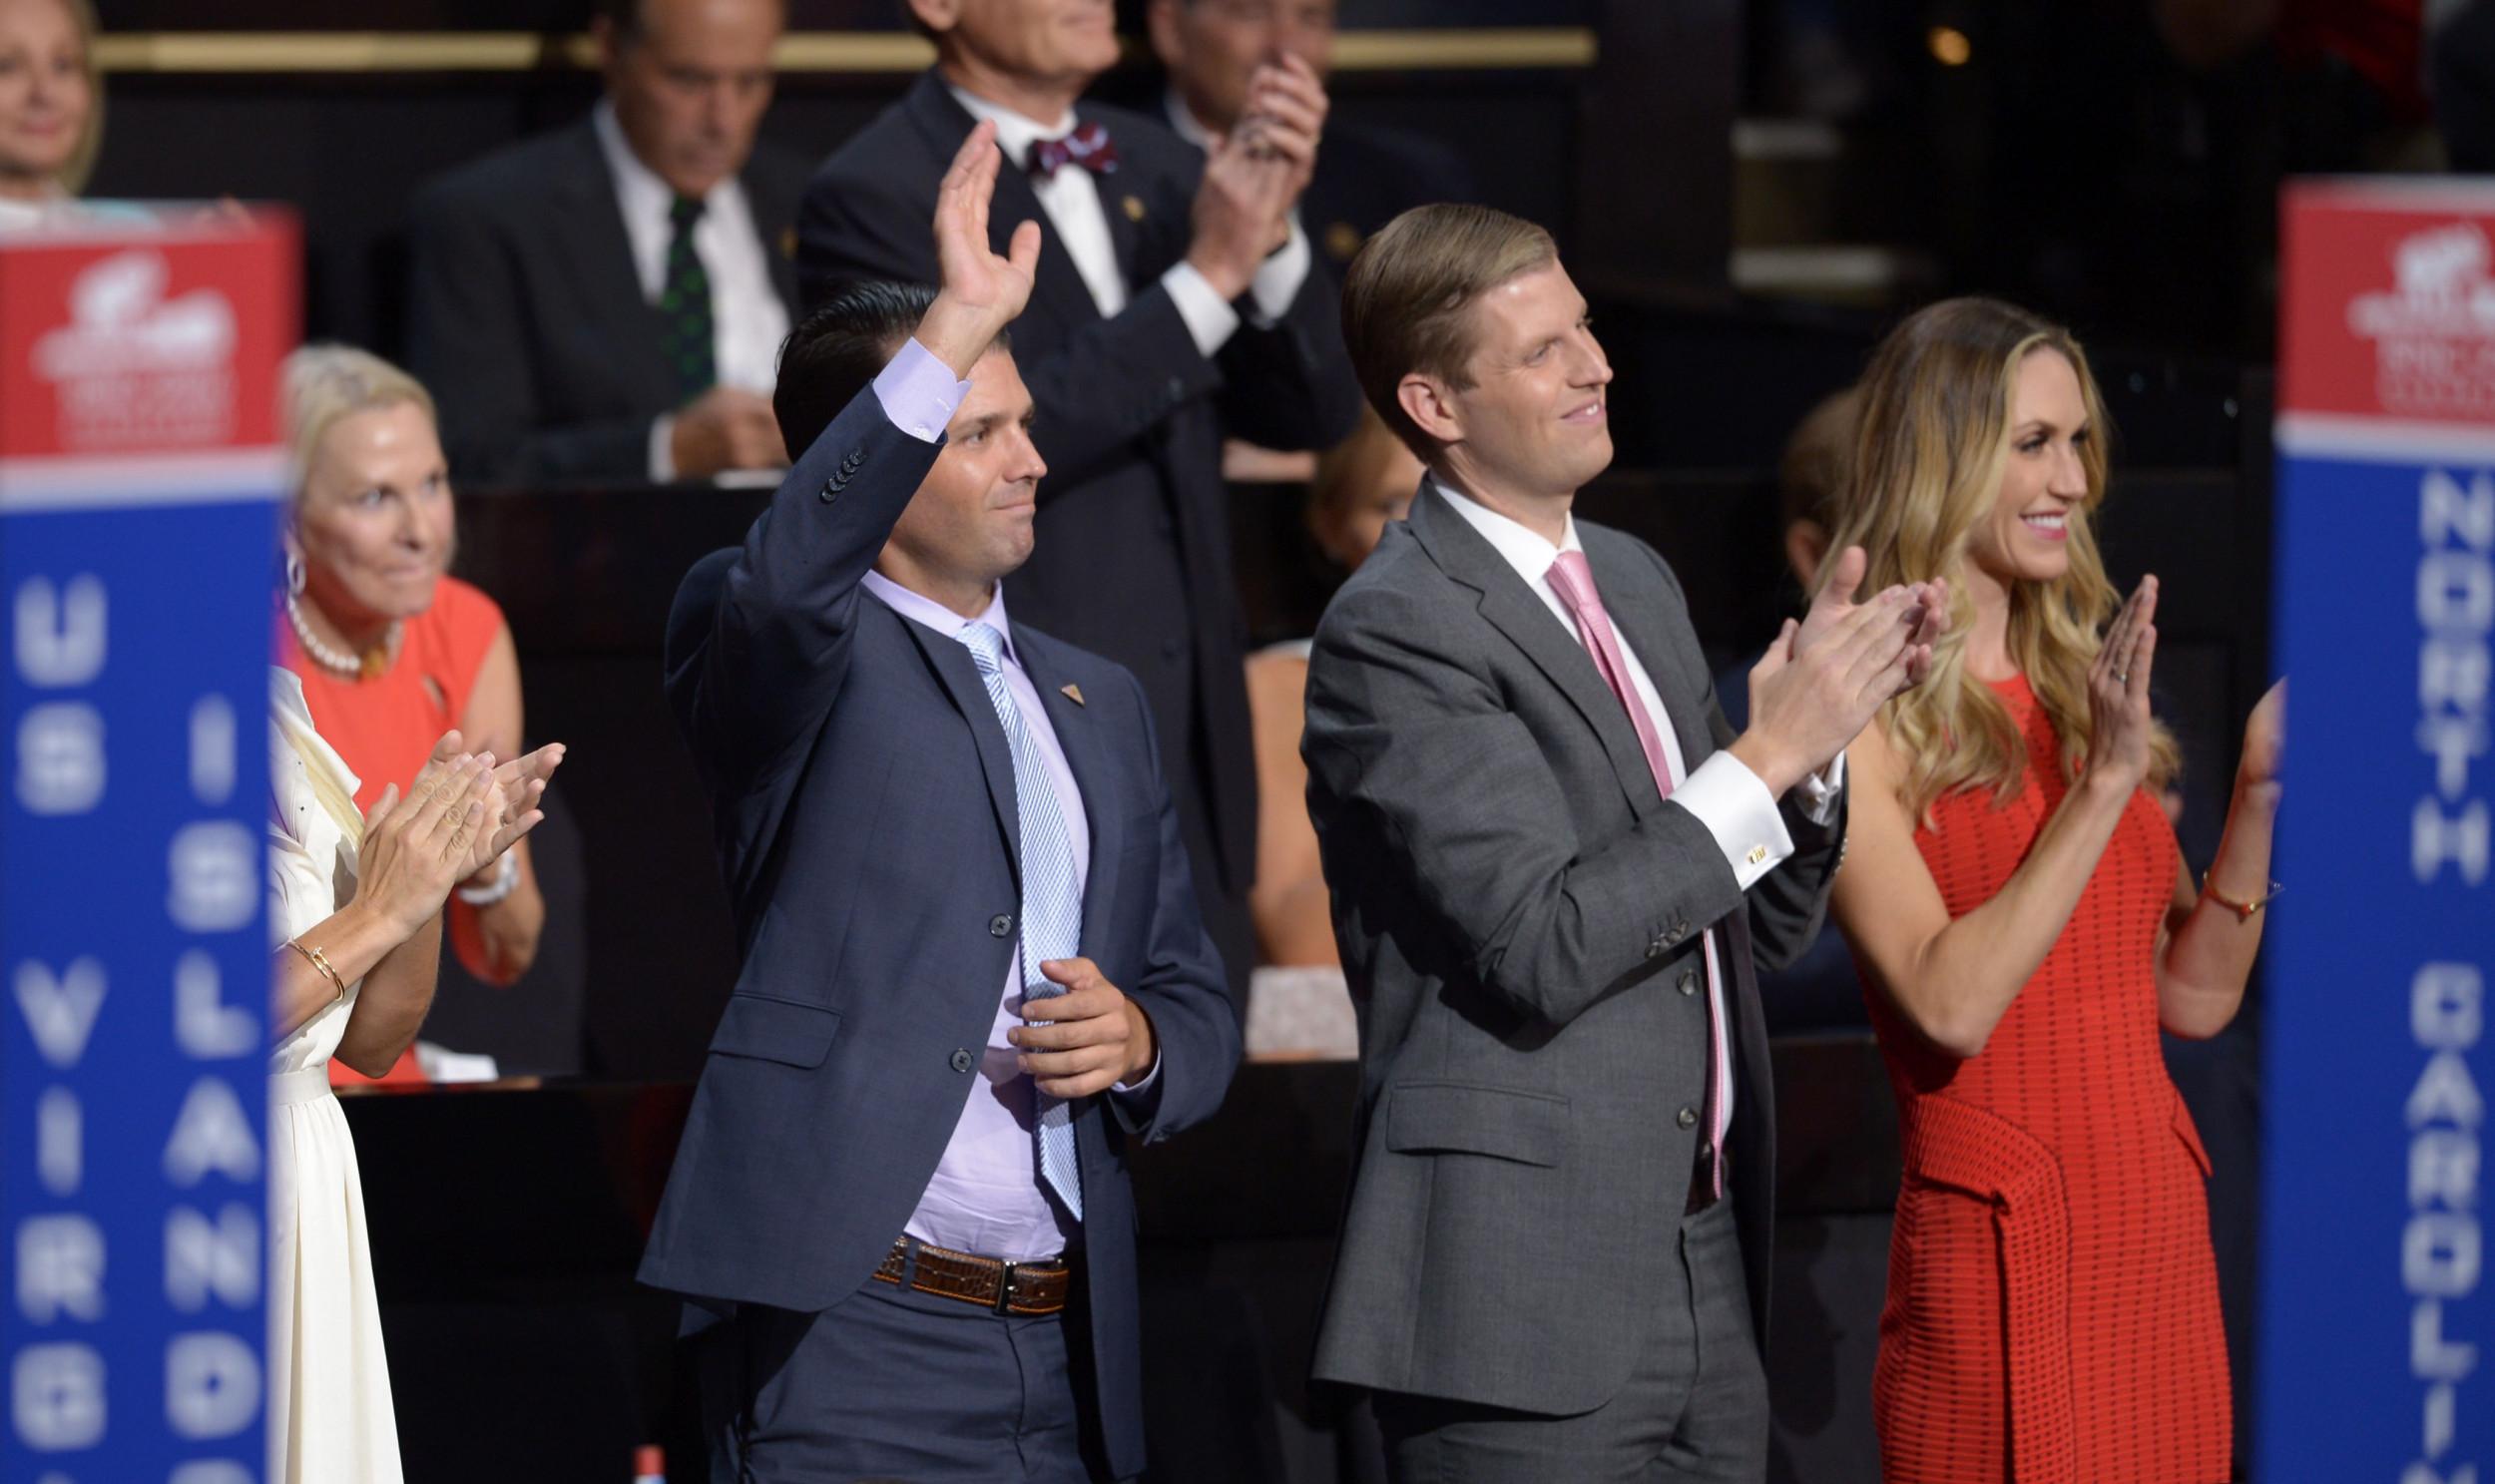 Donald Trump Jr., Lara Trump Could Win New York Congress Seat As 'Trump Is Still a Magic Name,' Says Retiring GOP Lawmaker